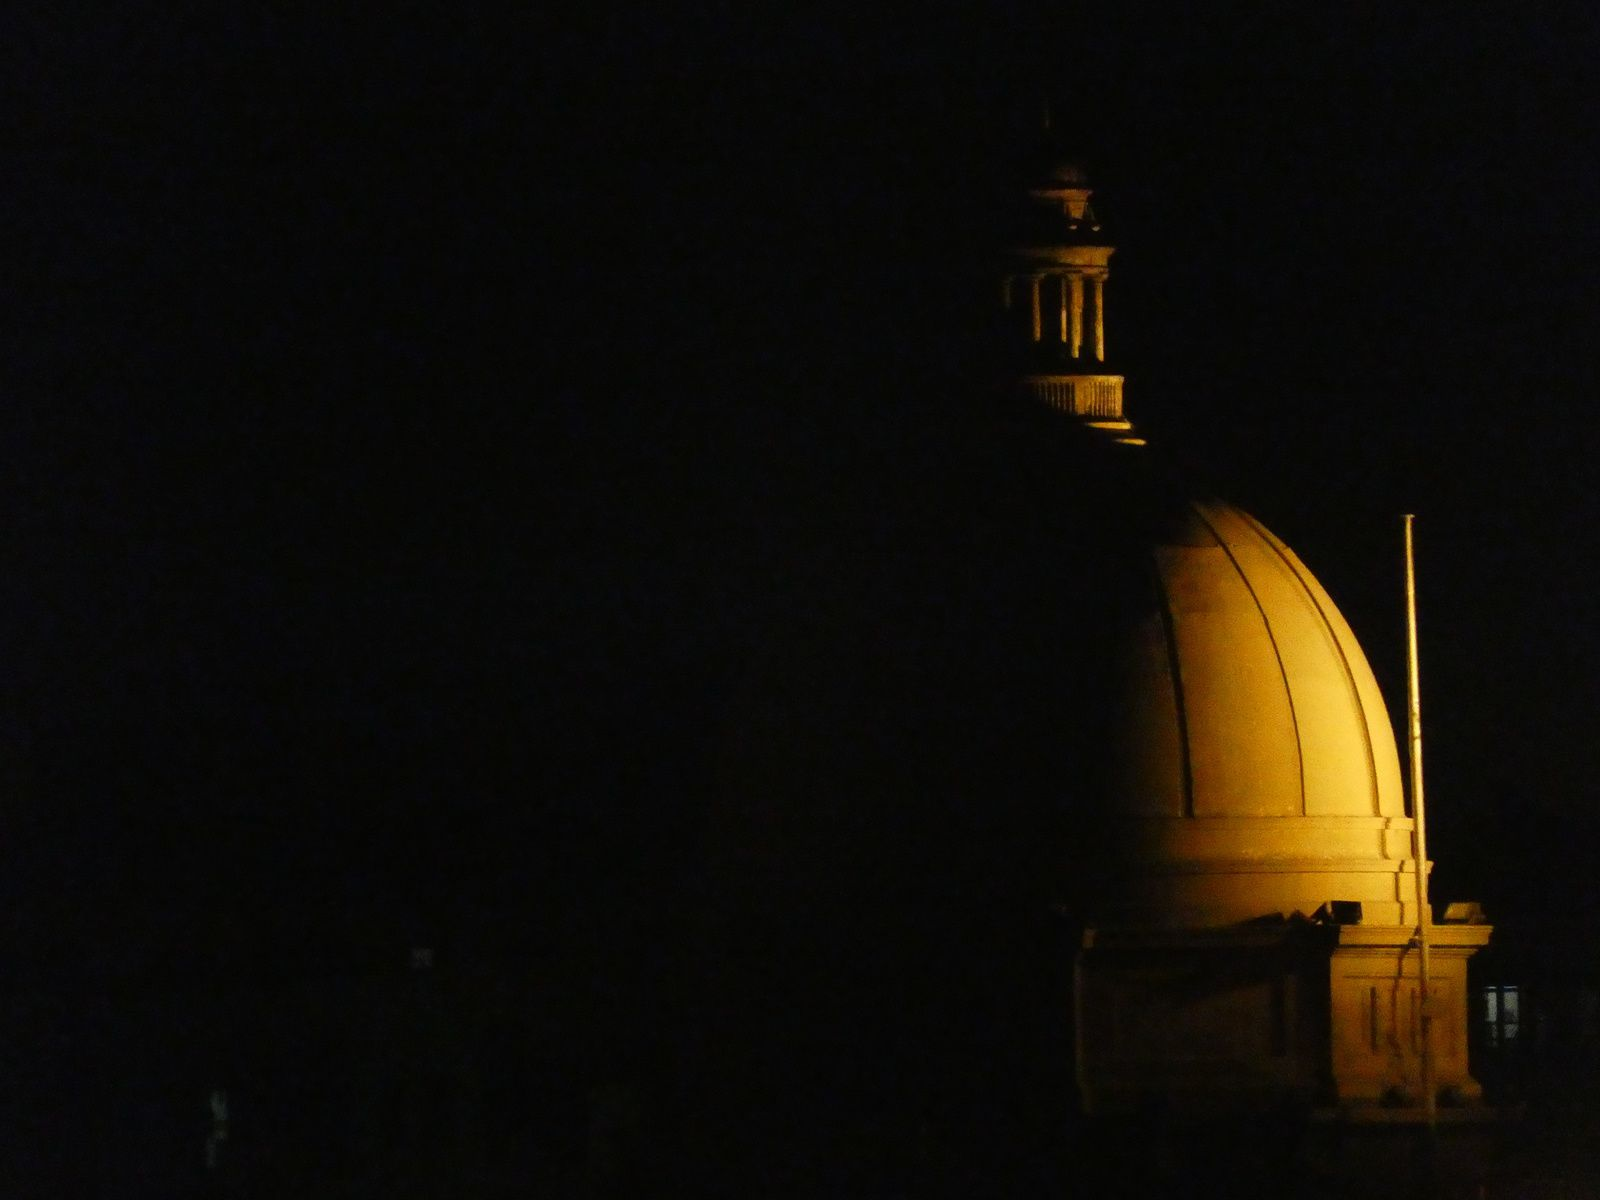 Karachi by night, Pakistan - Avril 2017